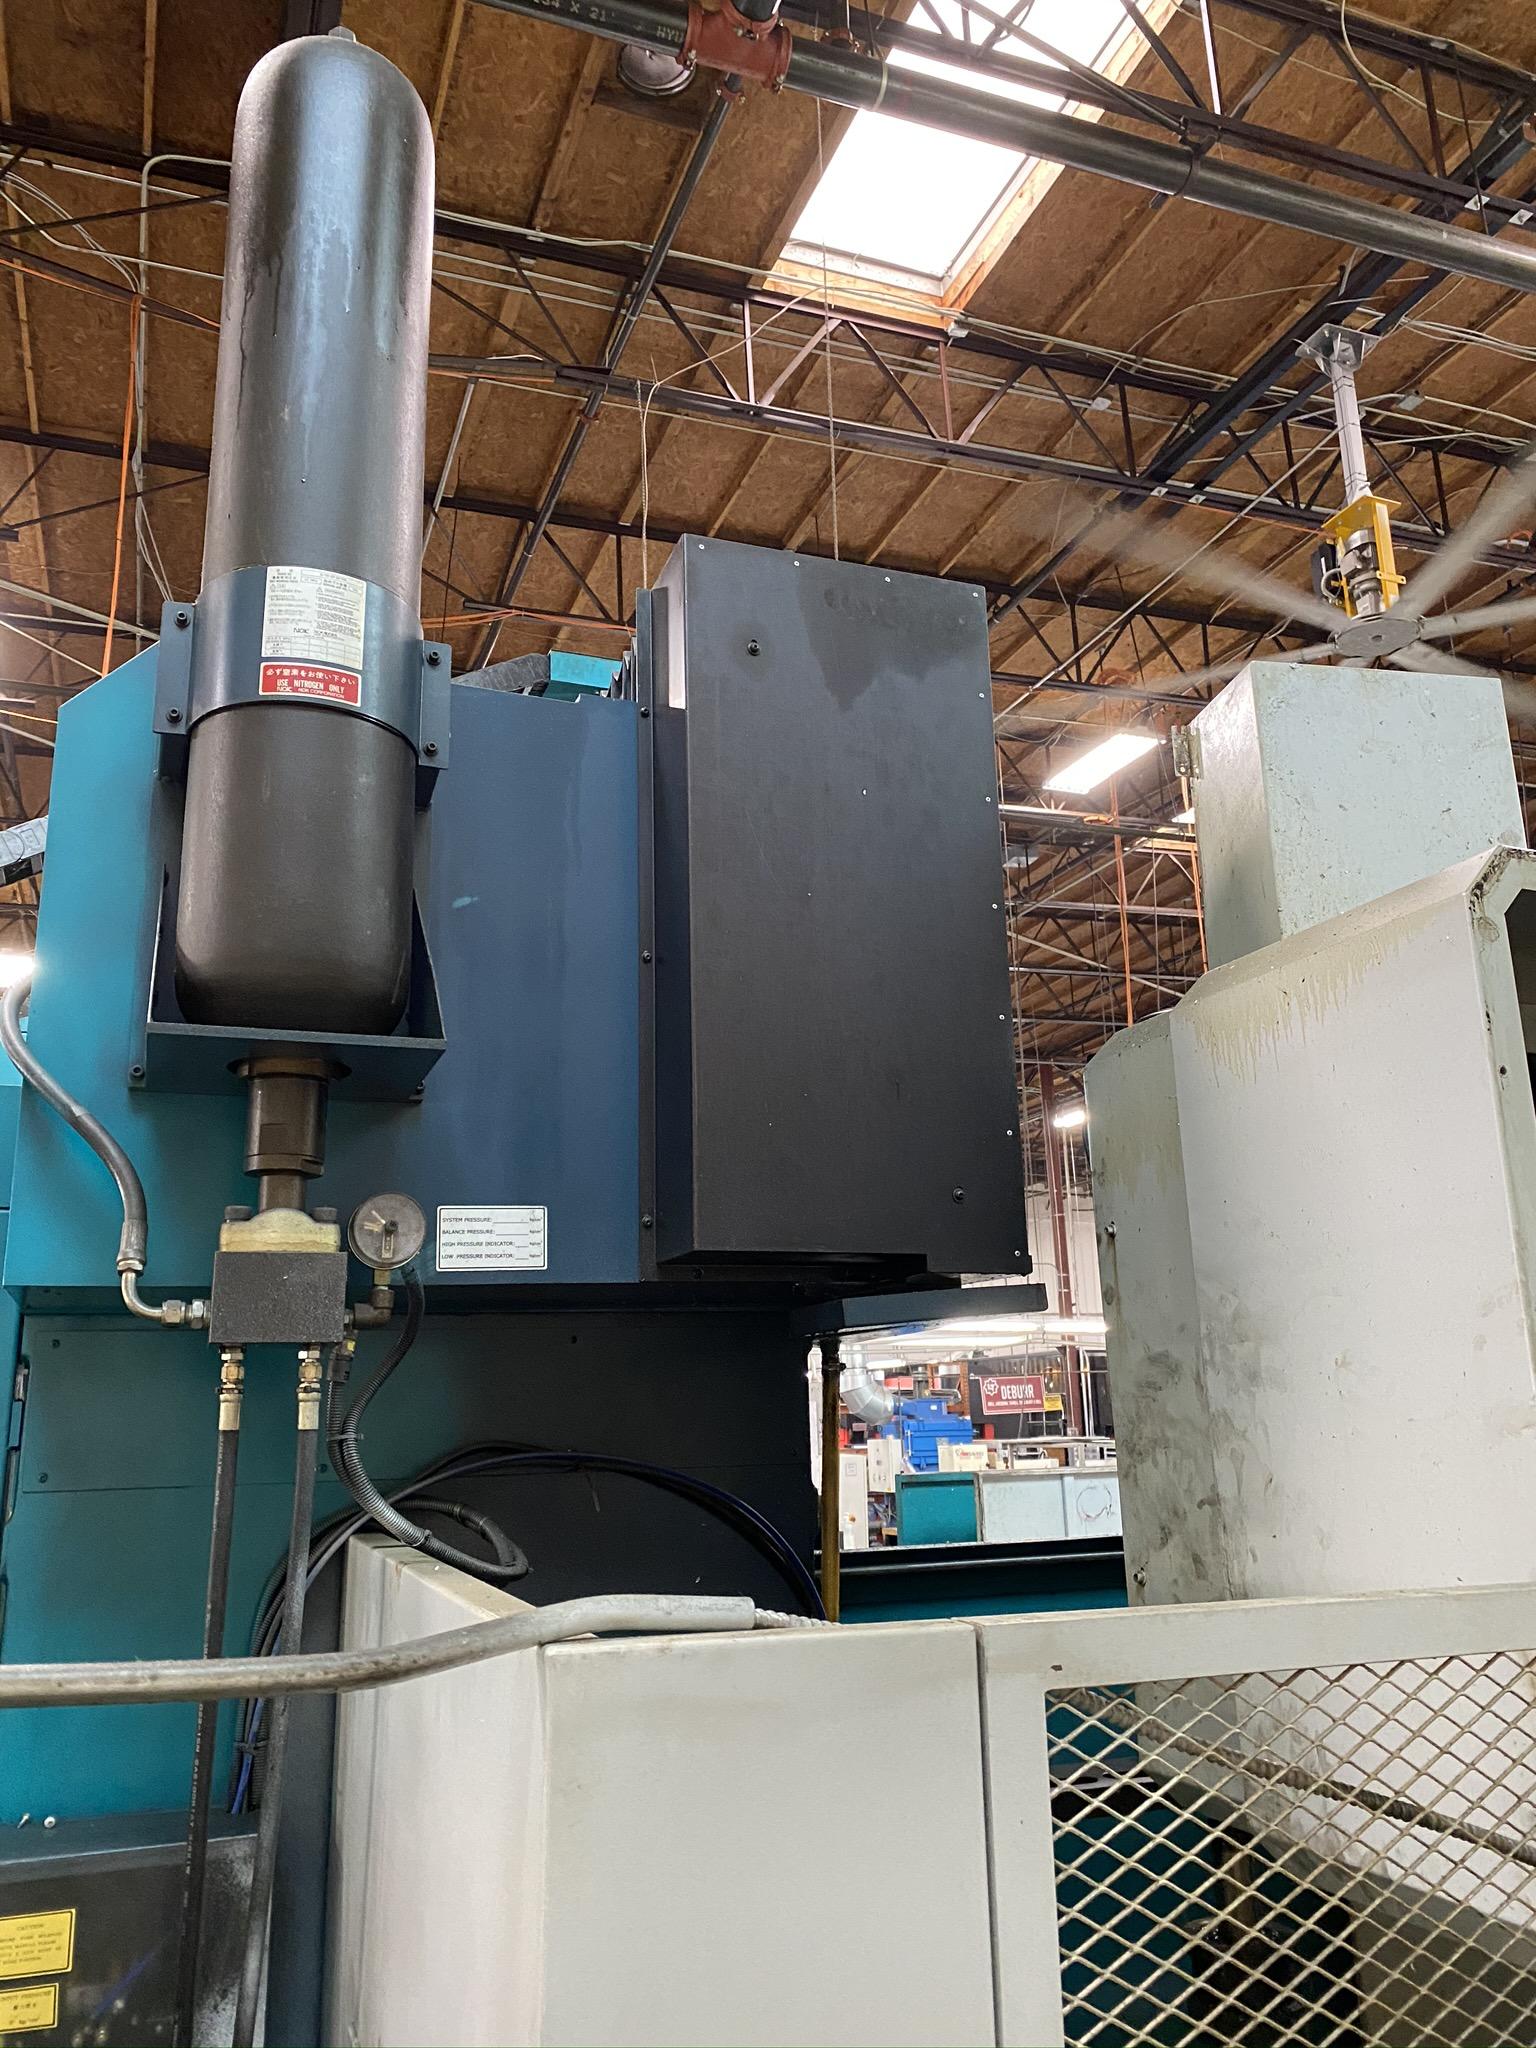 2005 SIGMA CNC DOUBLE COLUMN MACHINING CENTER, MODEL SDV-3219, FANUC 18IMB CNC CONTROL - Image 13 of 31